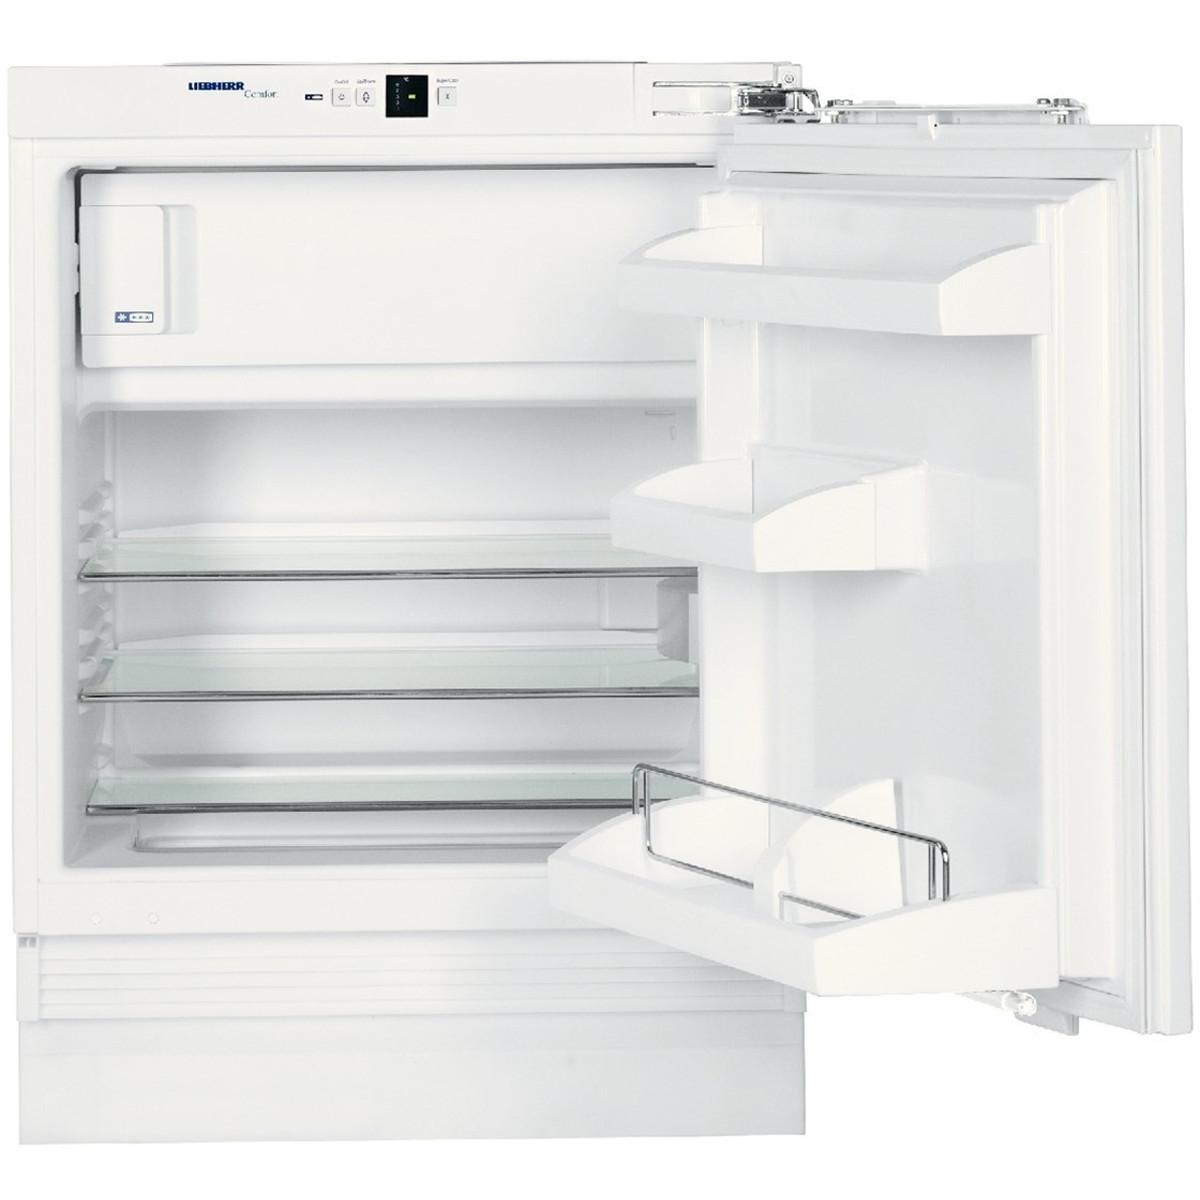 liebherr uik 1424 comfort undercounter refrigerator discount appliance centre. Black Bedroom Furniture Sets. Home Design Ideas